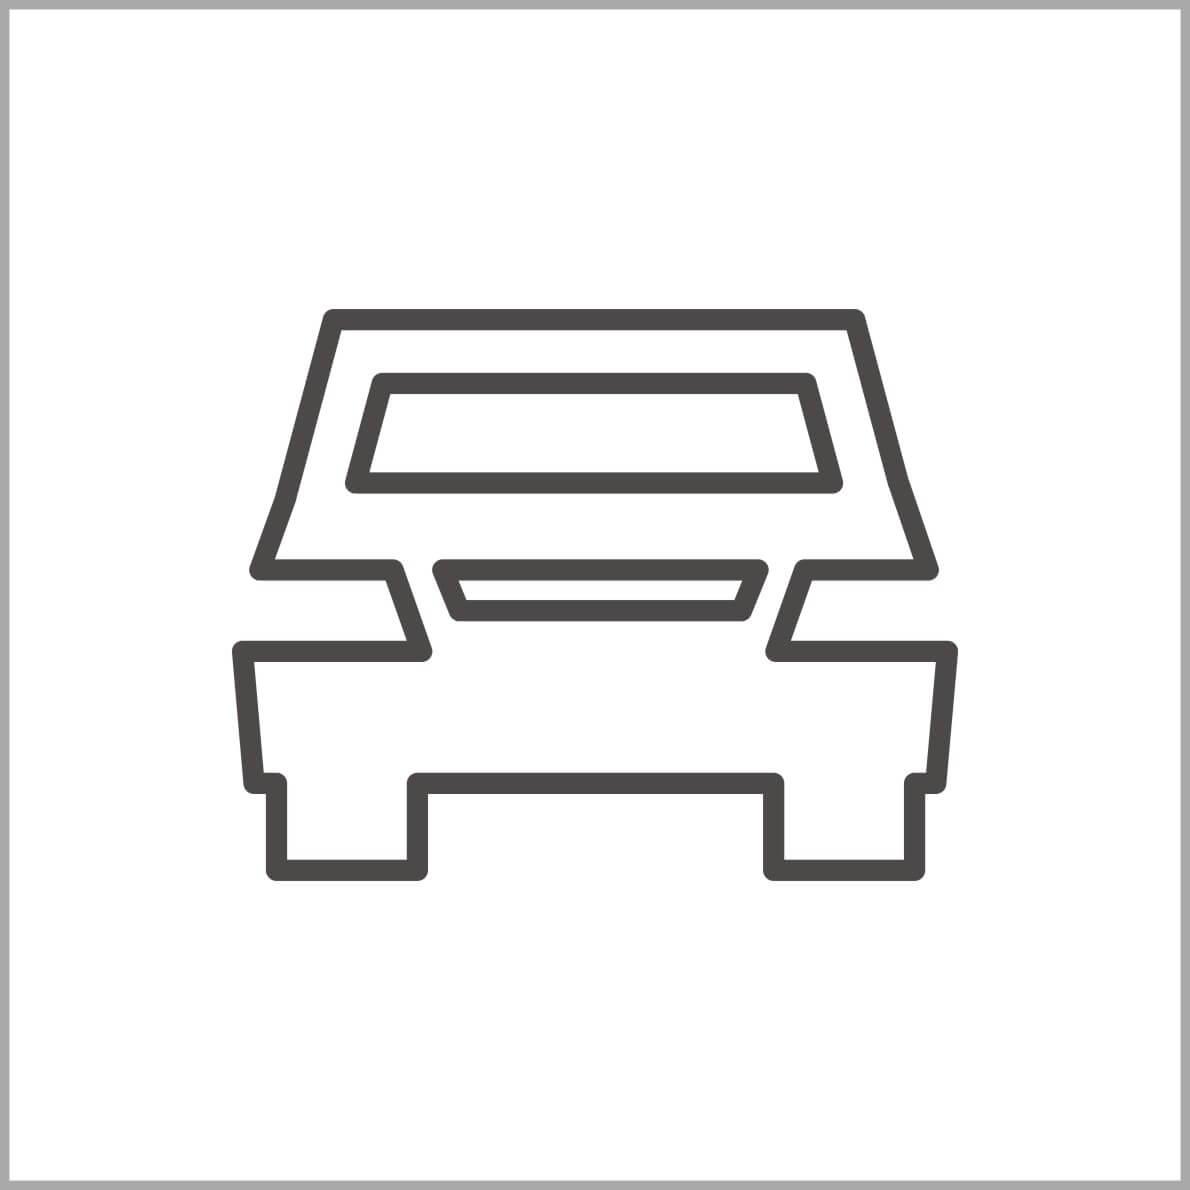 Hiboost-icon-sedan/truck